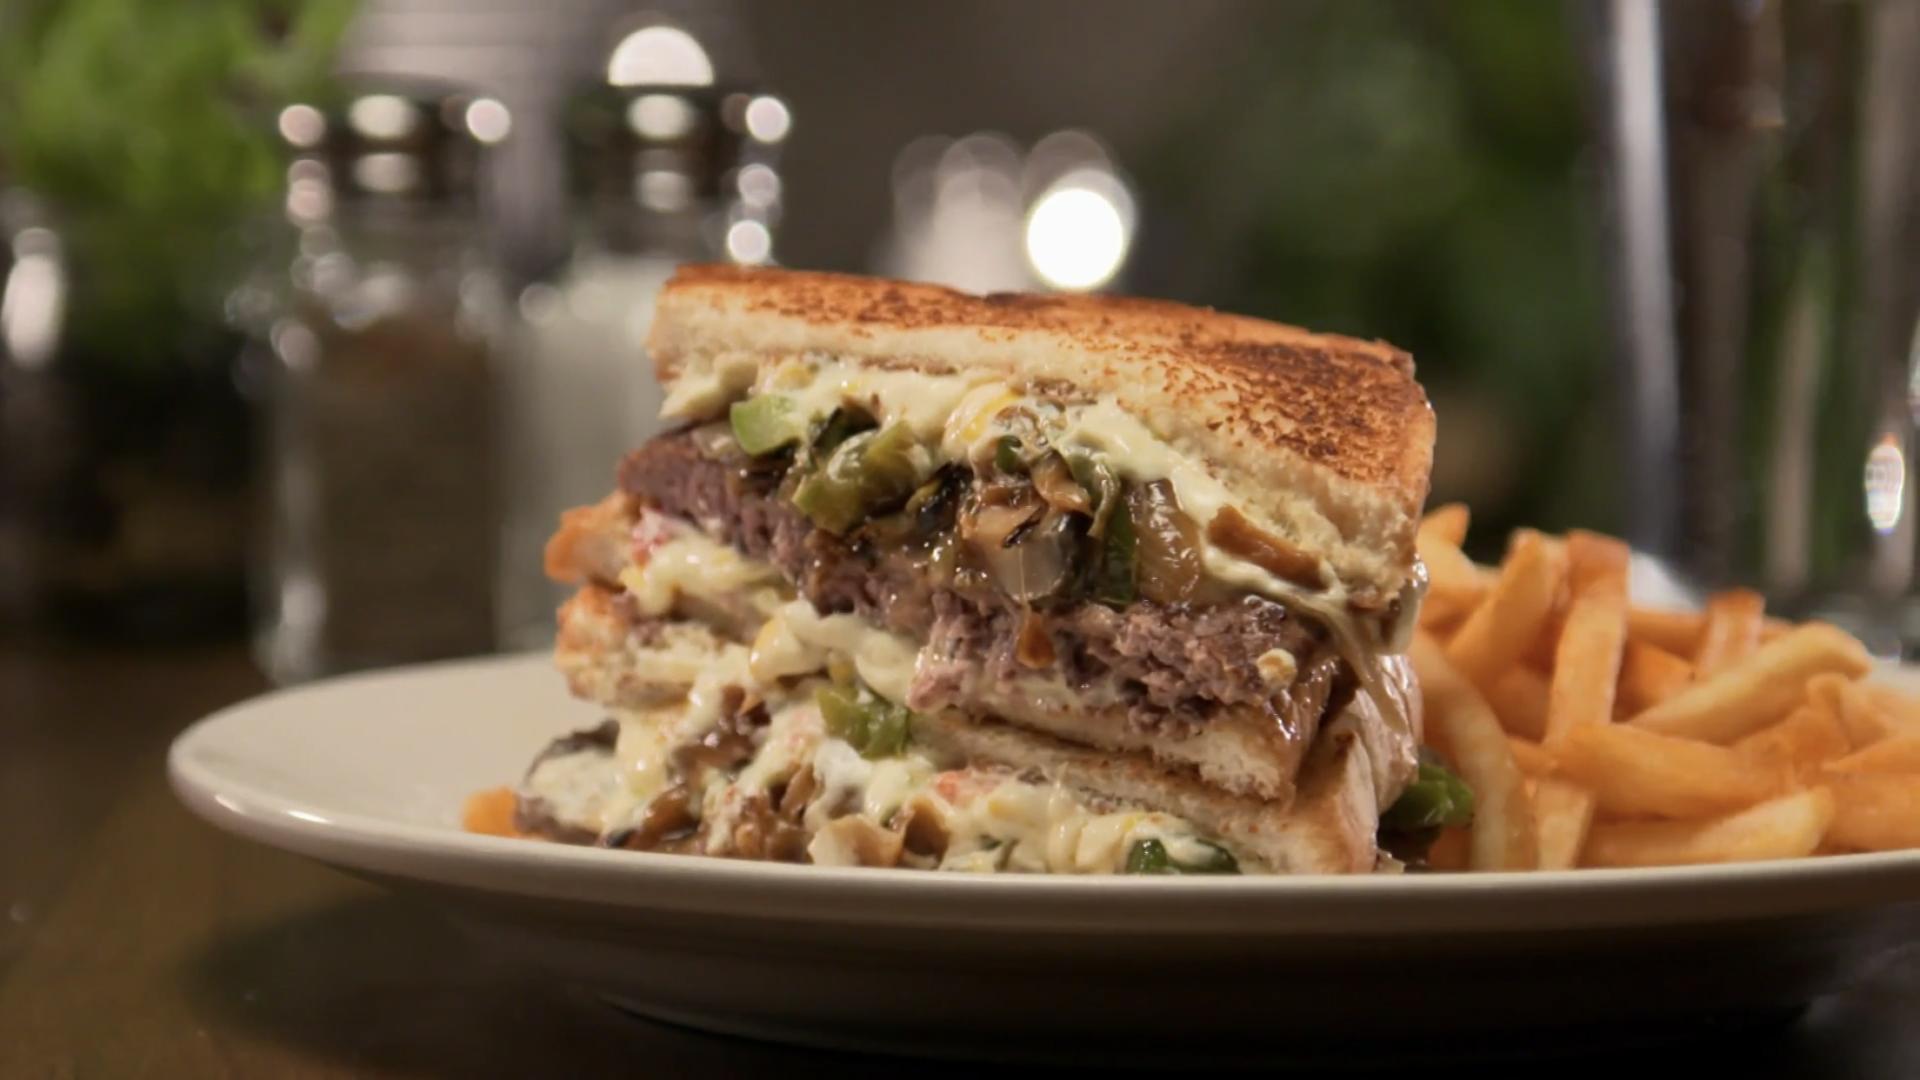 Pimento Cheeseburger with Mushroom Gravy – As Seen on Restaurant: Impossible - Robert Irvine